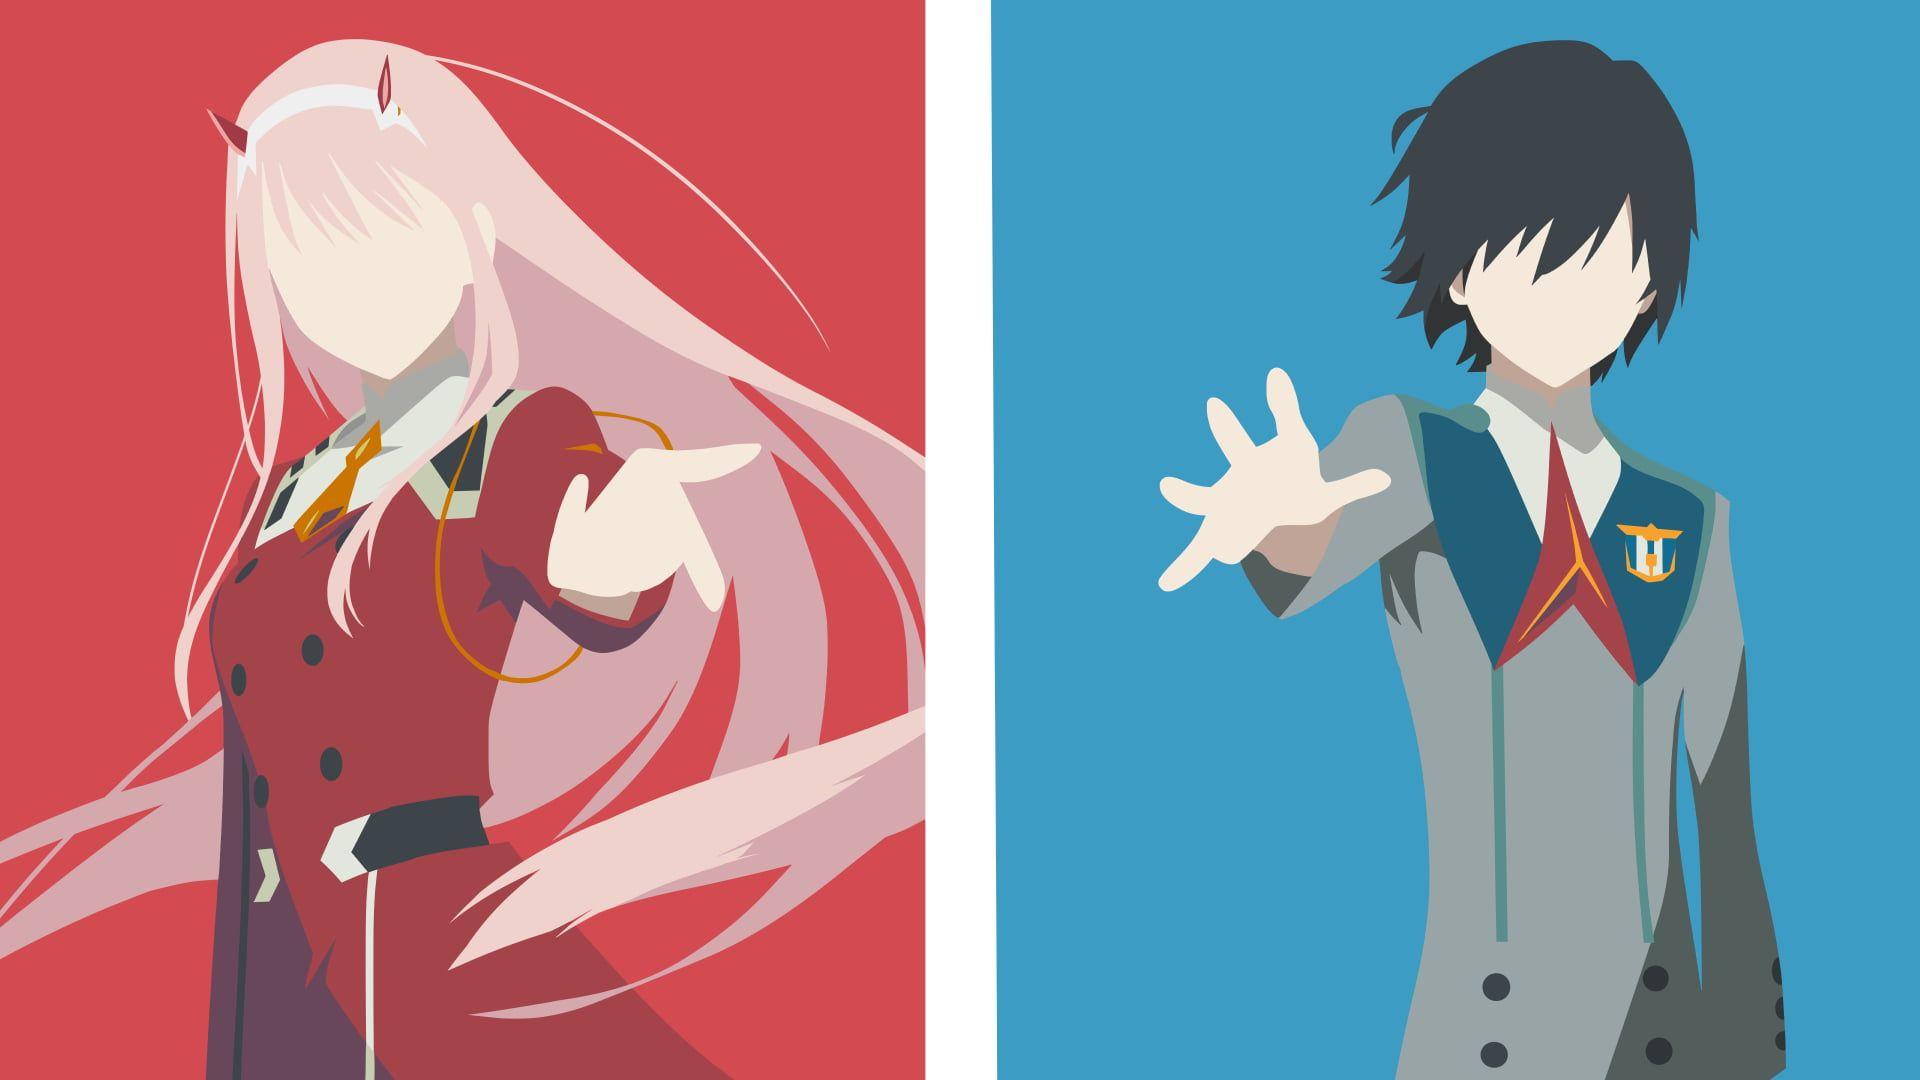 HD wallpaper: Darling in the FranXX, anime girls, anime boys, Zero Two (Darling in the FranXX)